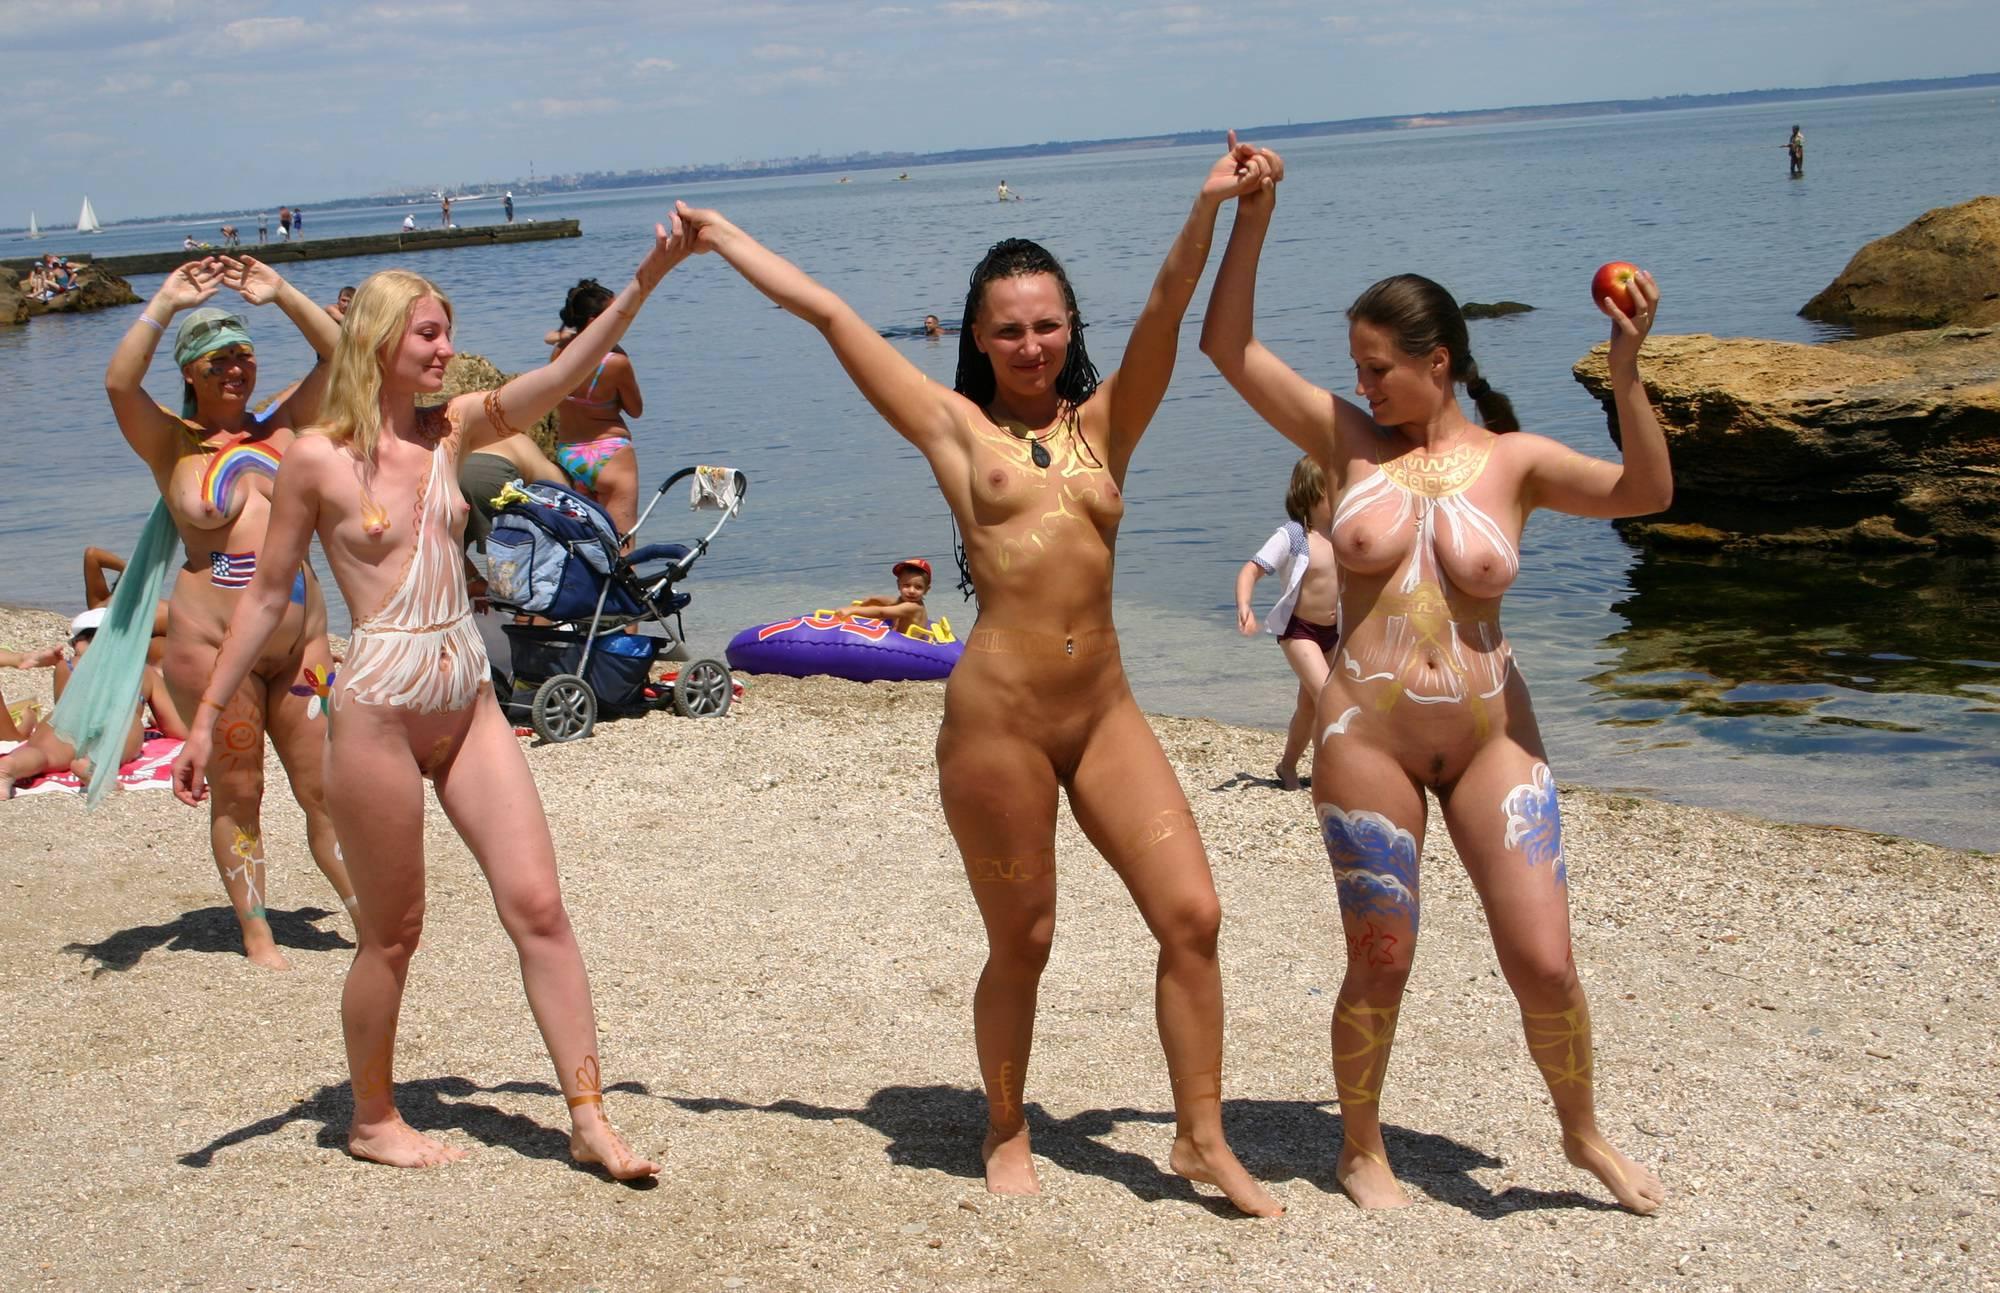 Nudist Pics Odessa Bodypaint Profiles - 2